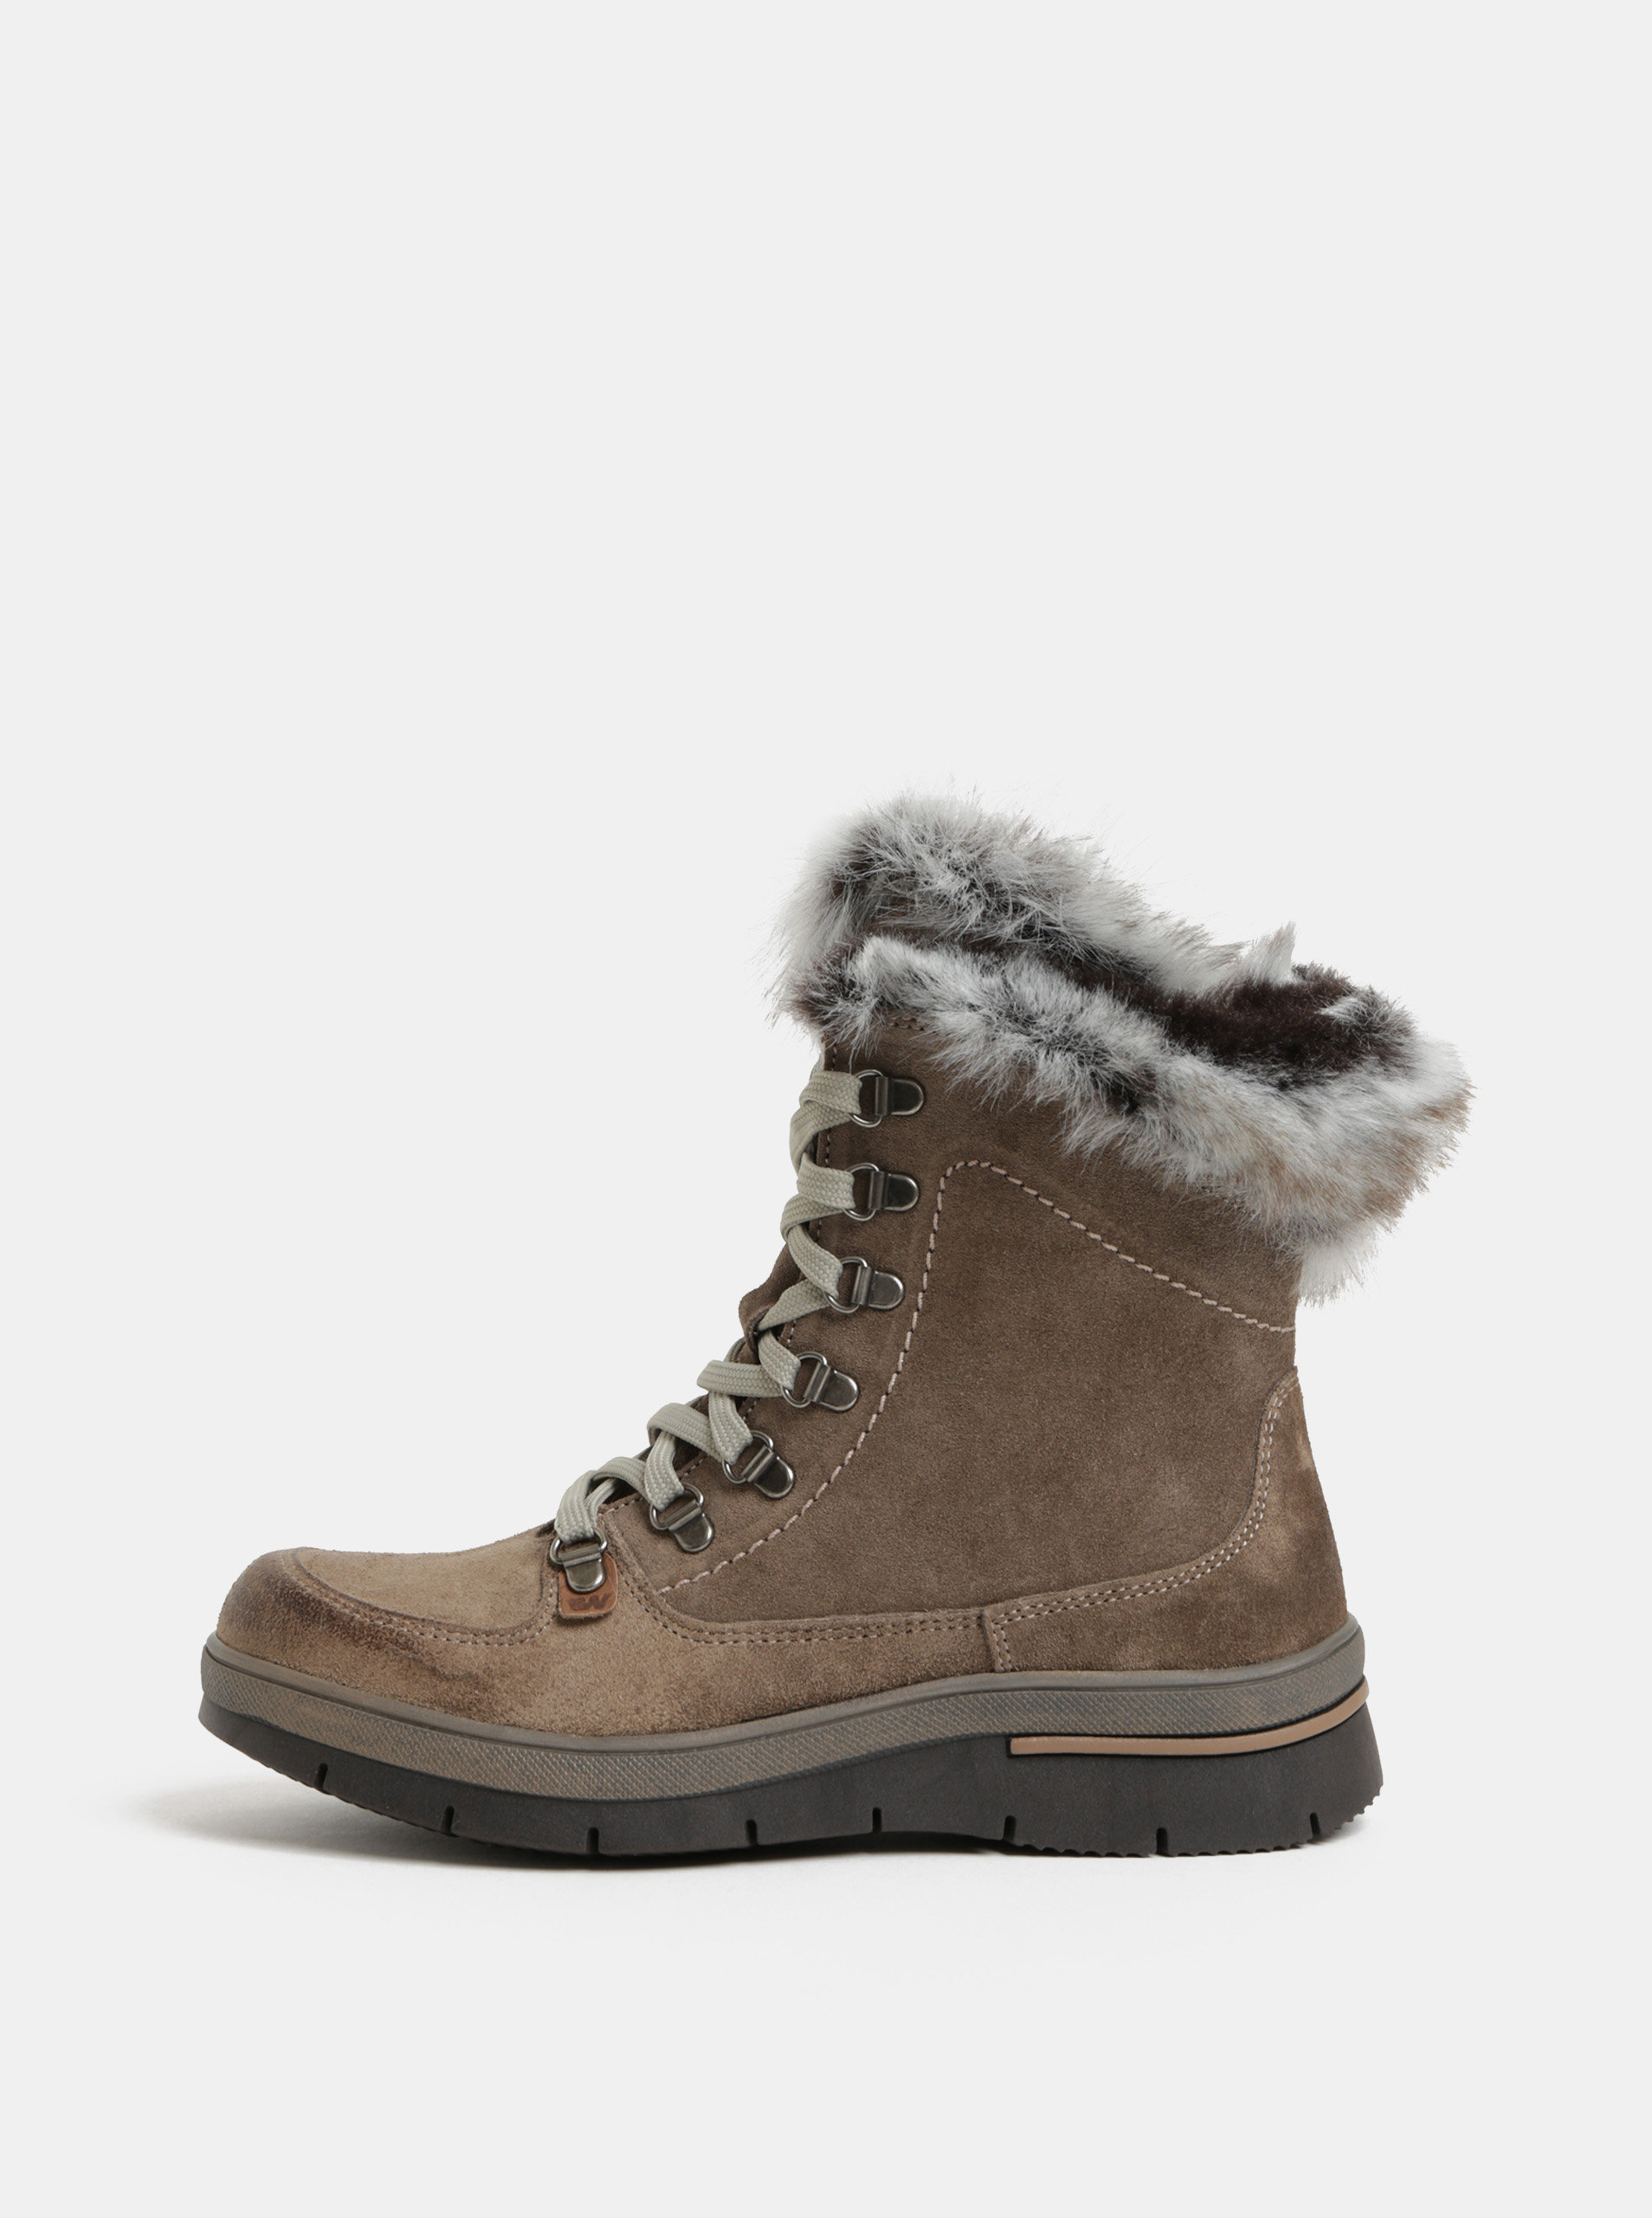 f45650afe2165 Hnedé semišové dámske členkové topánky s vnútornou umelou kožušinou  Weinbrenner ...